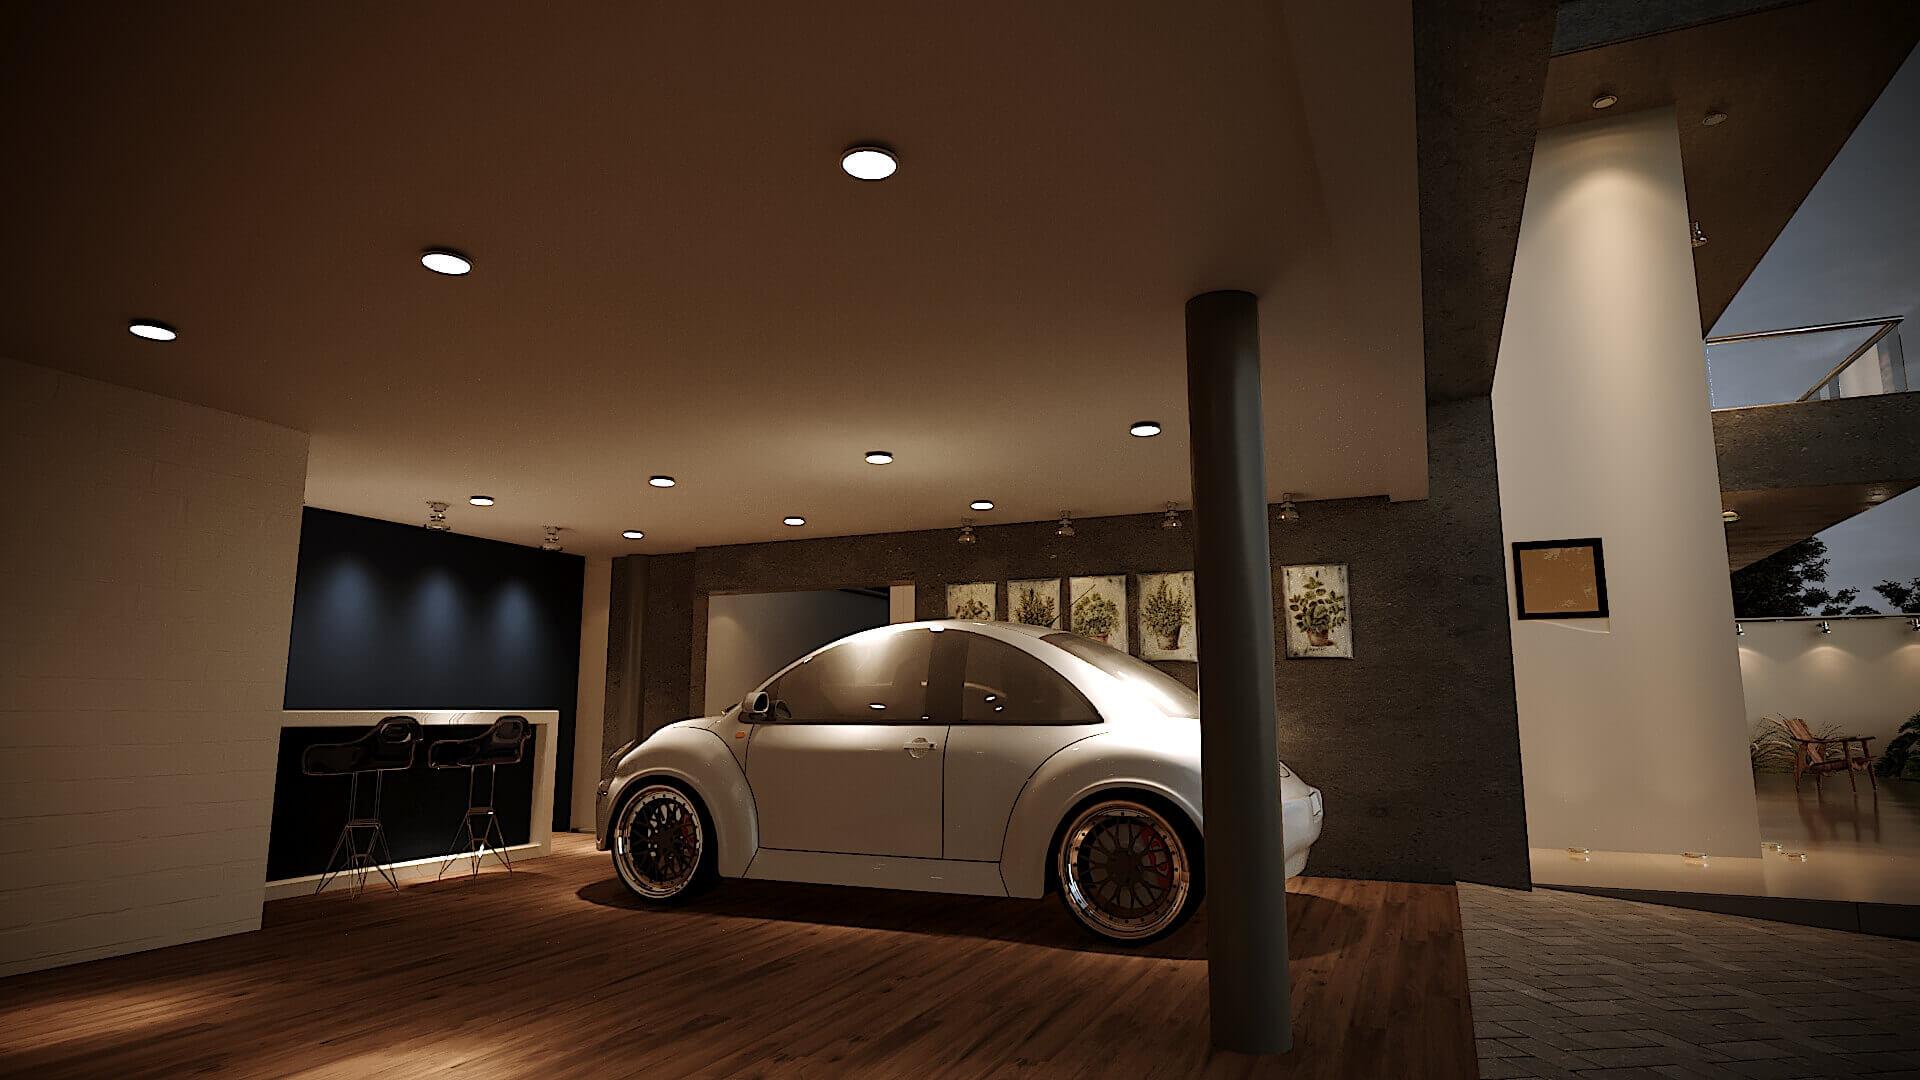 garagem, piso madeira